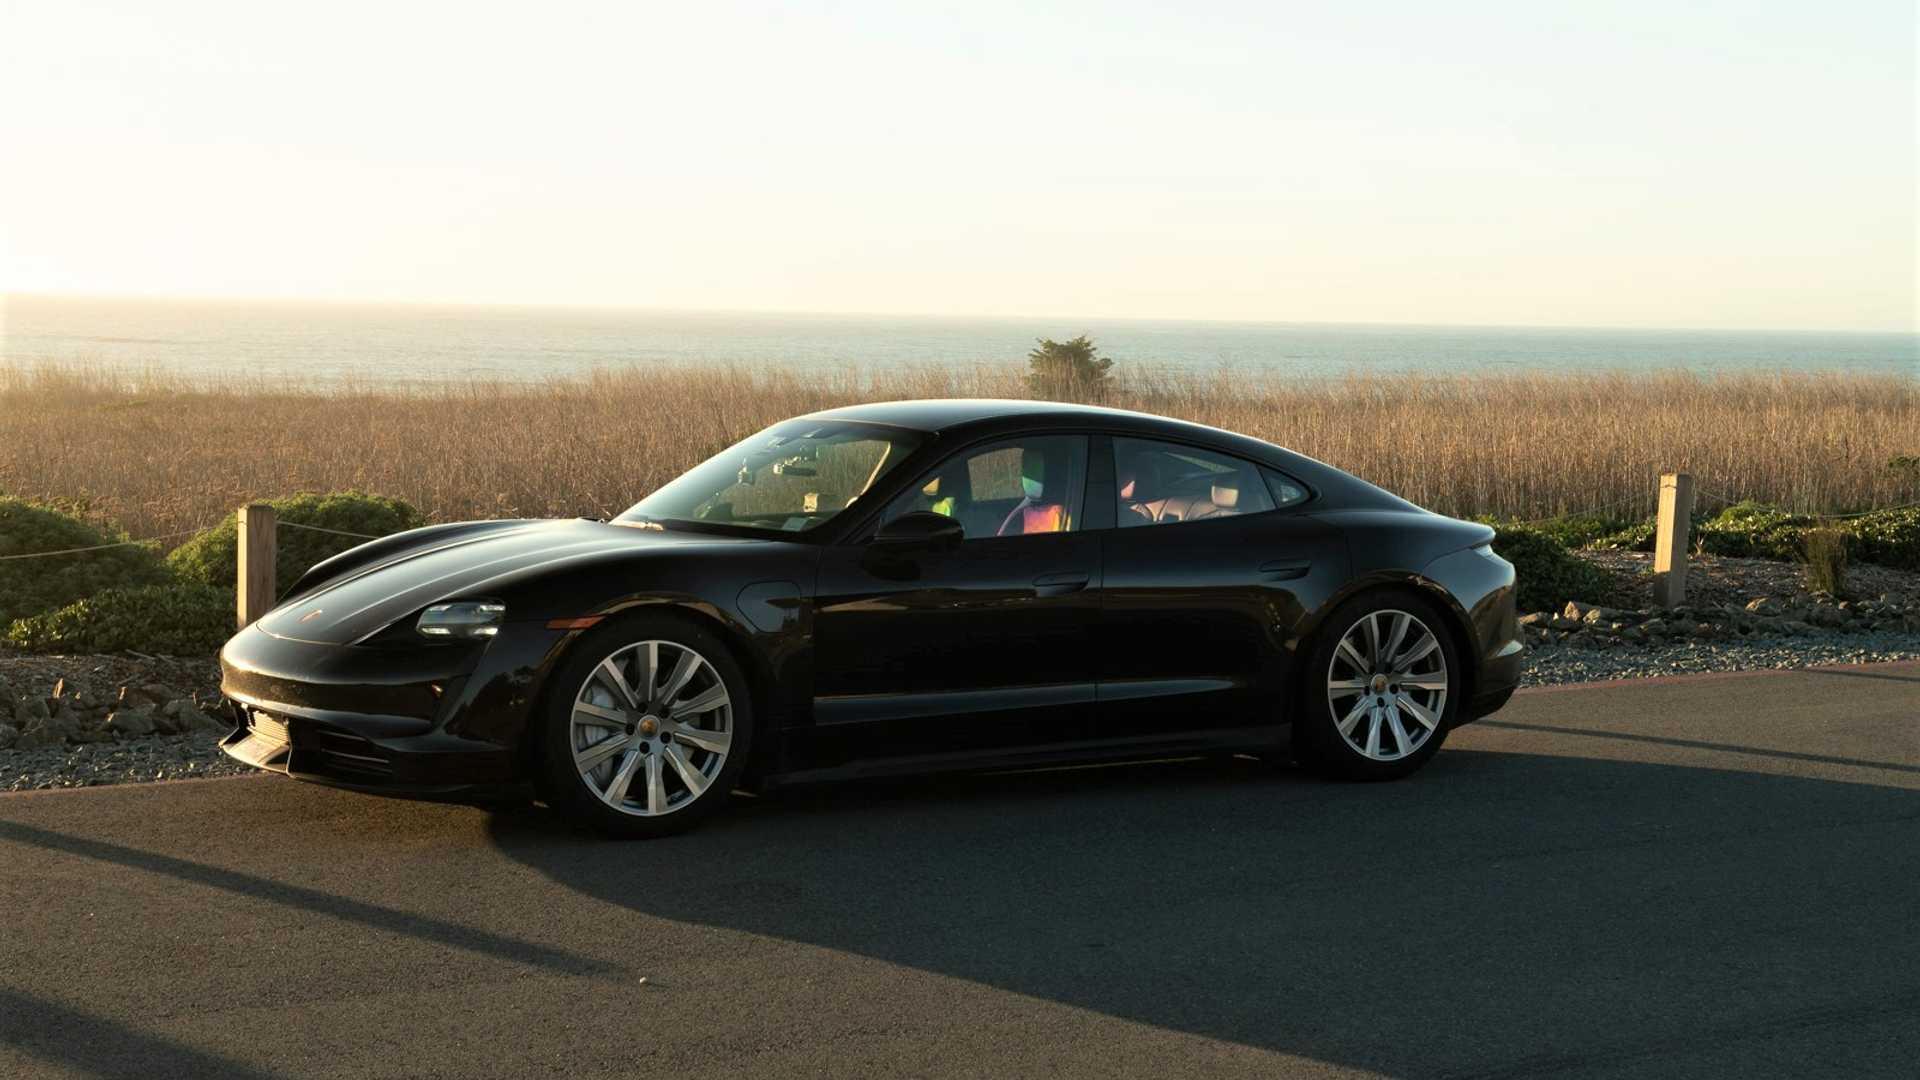 Road_trip_Porsche_Taycan_Turbo_0006